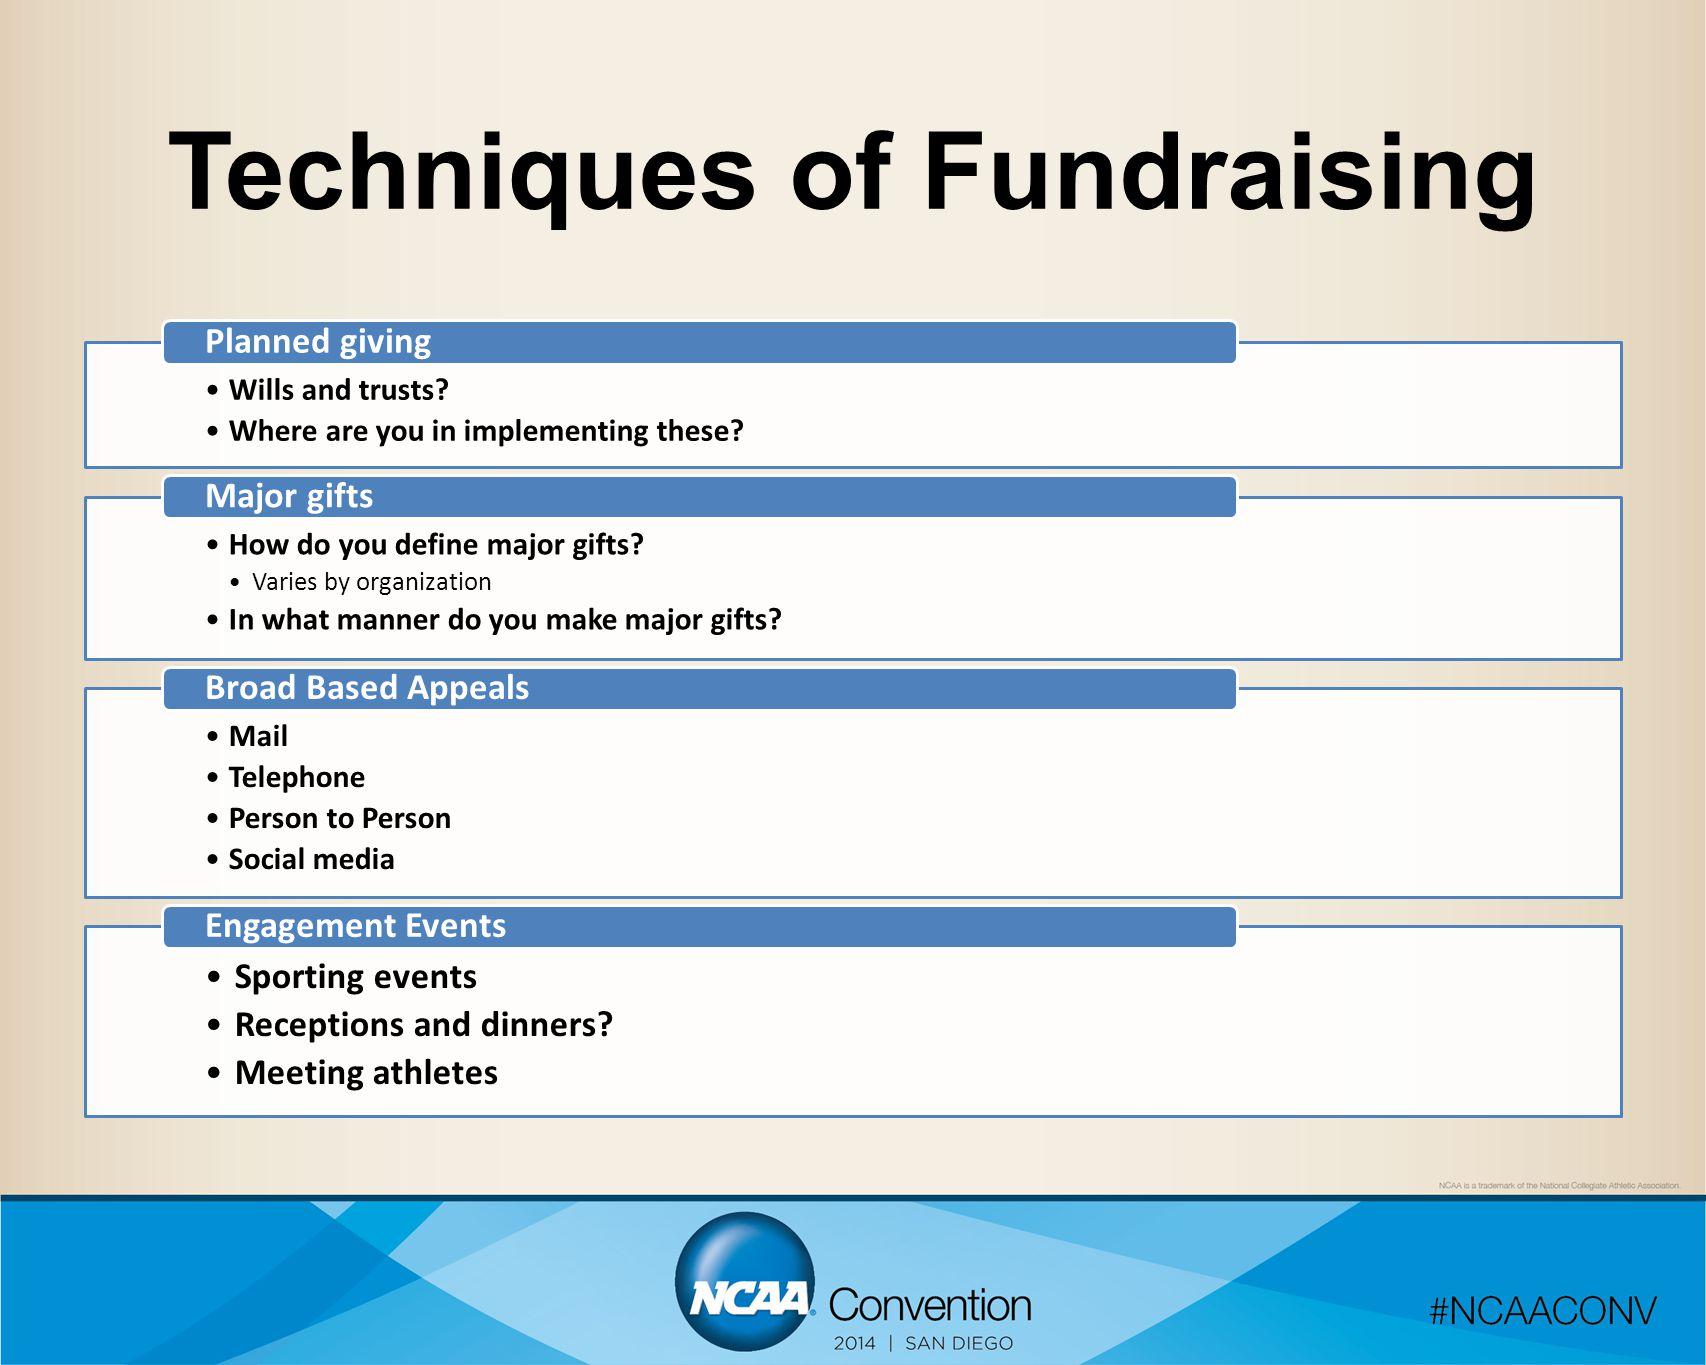 Techniques of Fundraising